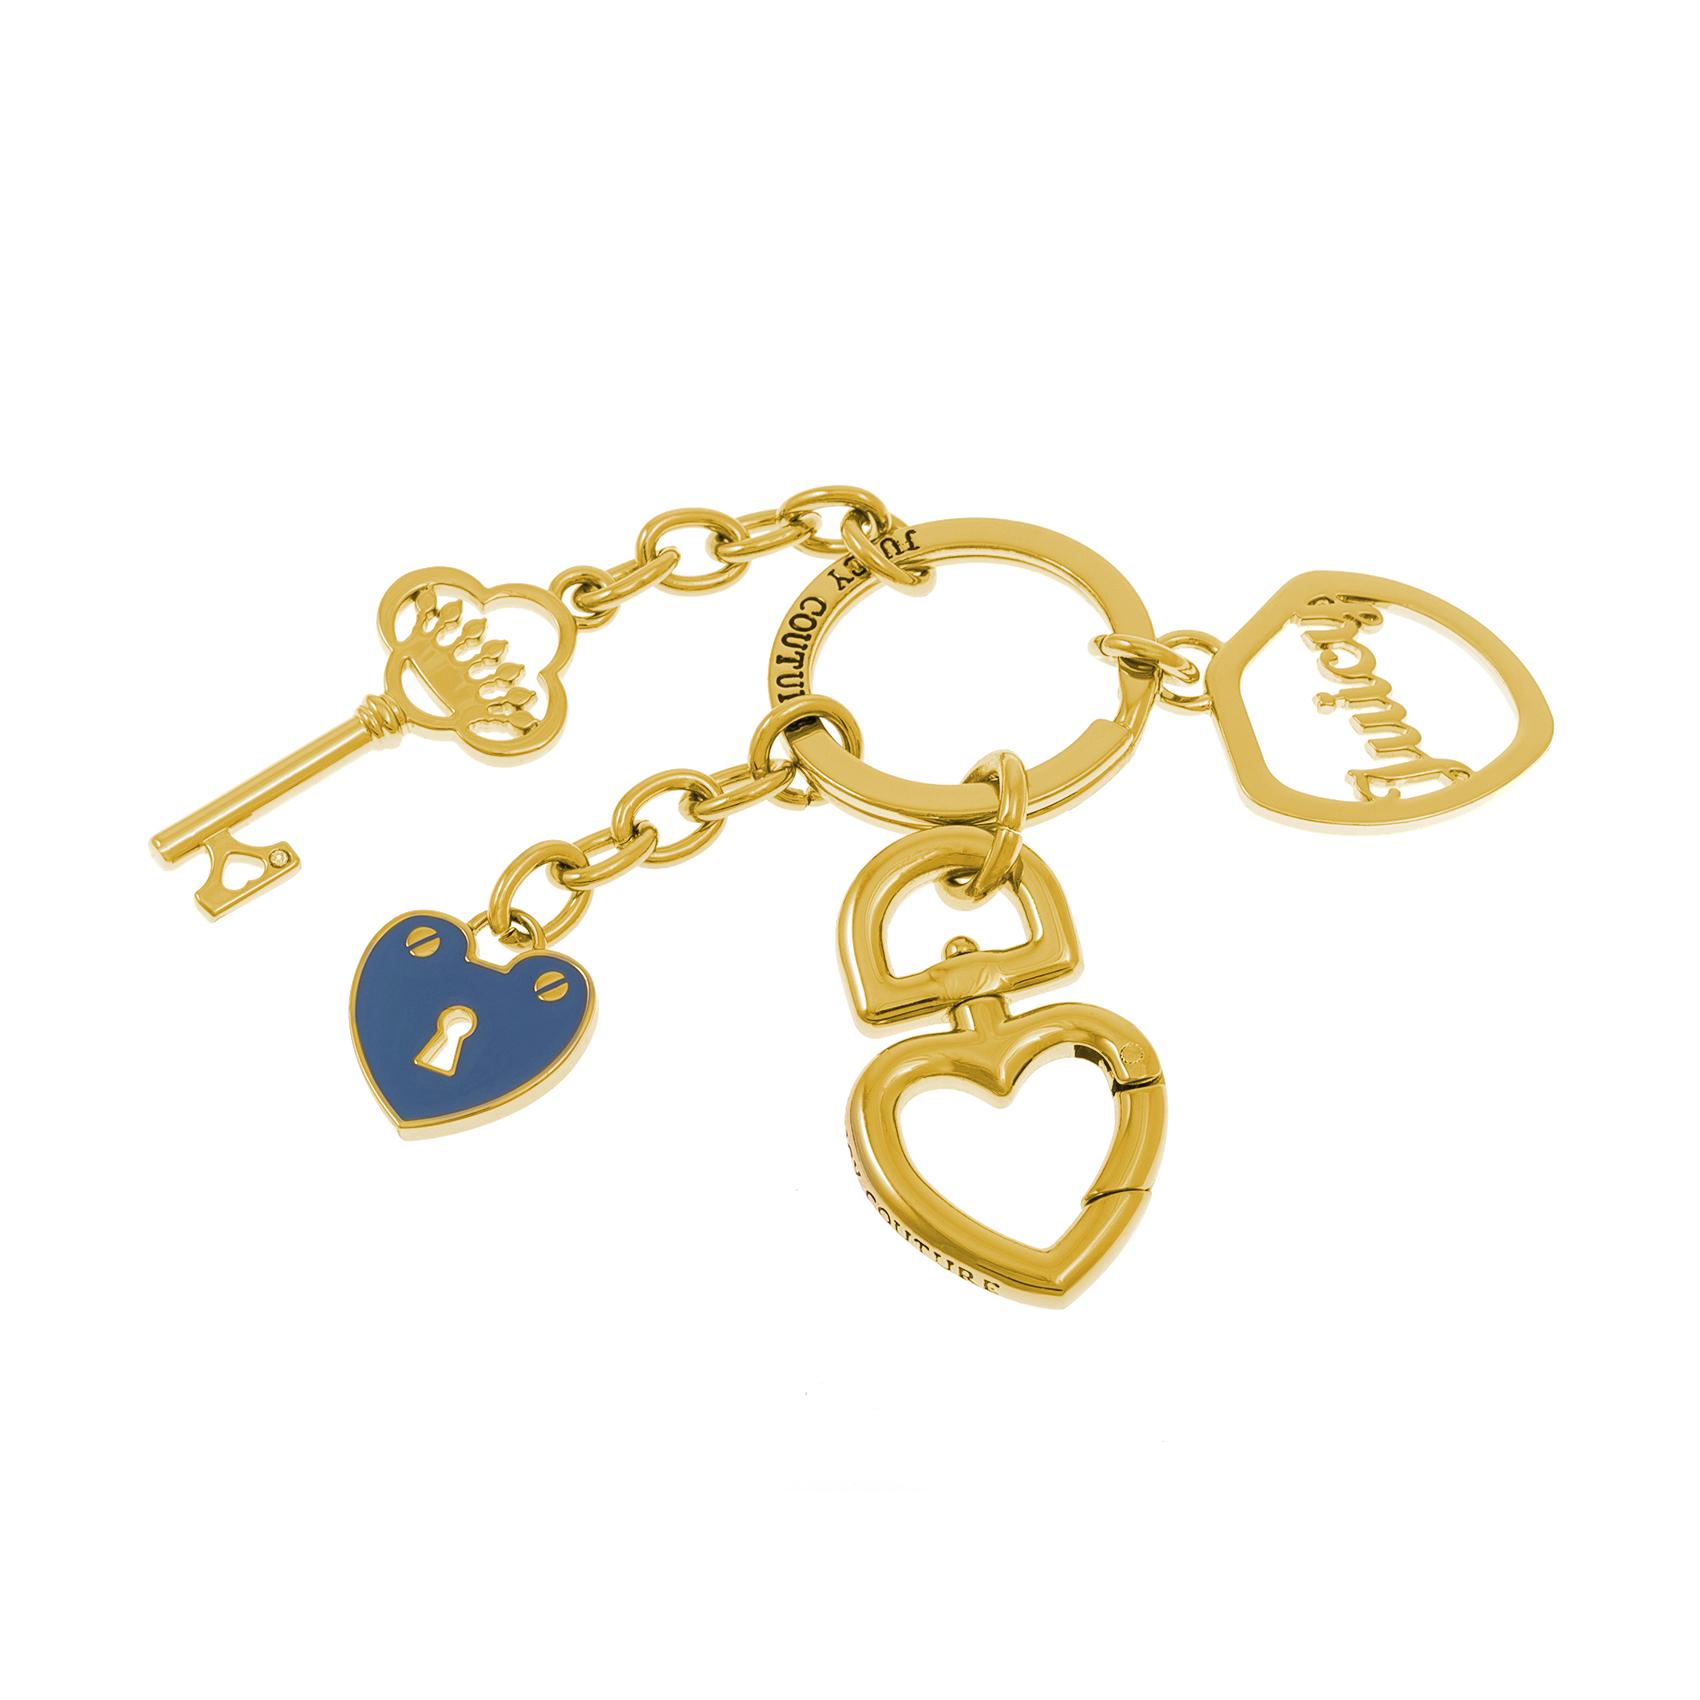 JUICY COUTURE – Μπρελόκ σφυρίχτρα JUICY COUTURE χρυσό-μπλε